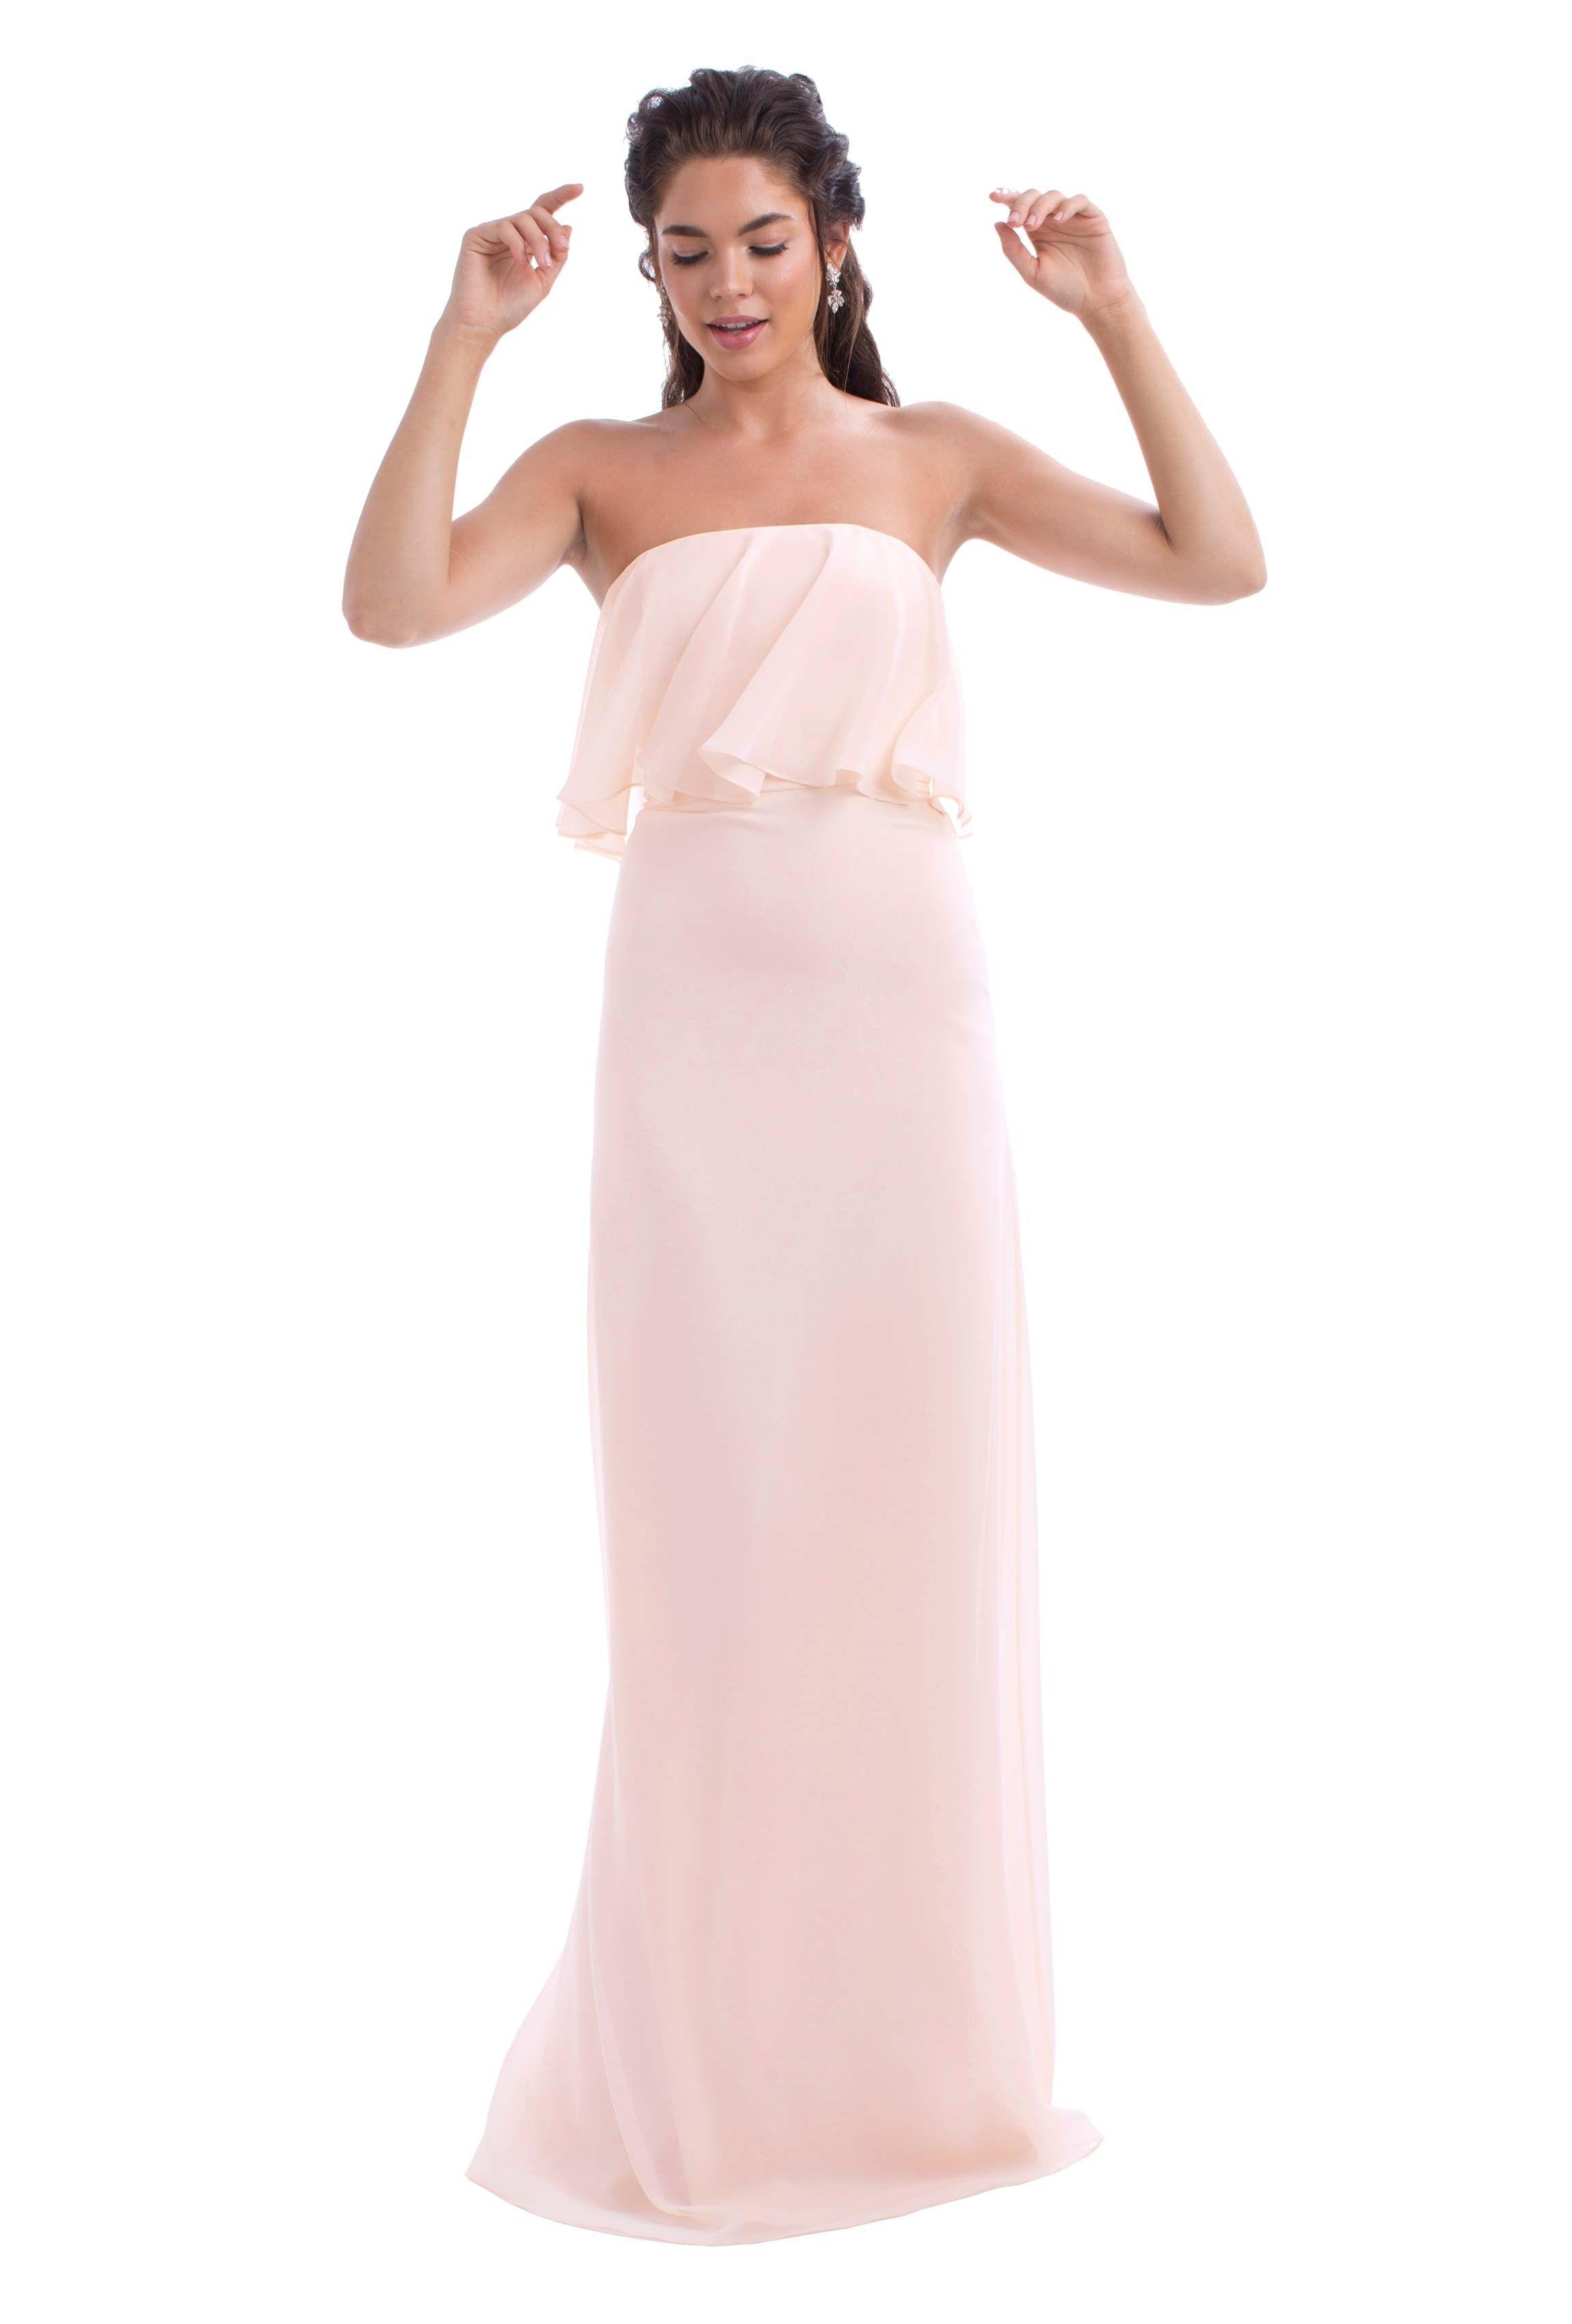 Rent wedding dresses  Monique Lhuillier Cara  Chiffon bridesmaid dresses and Wedding